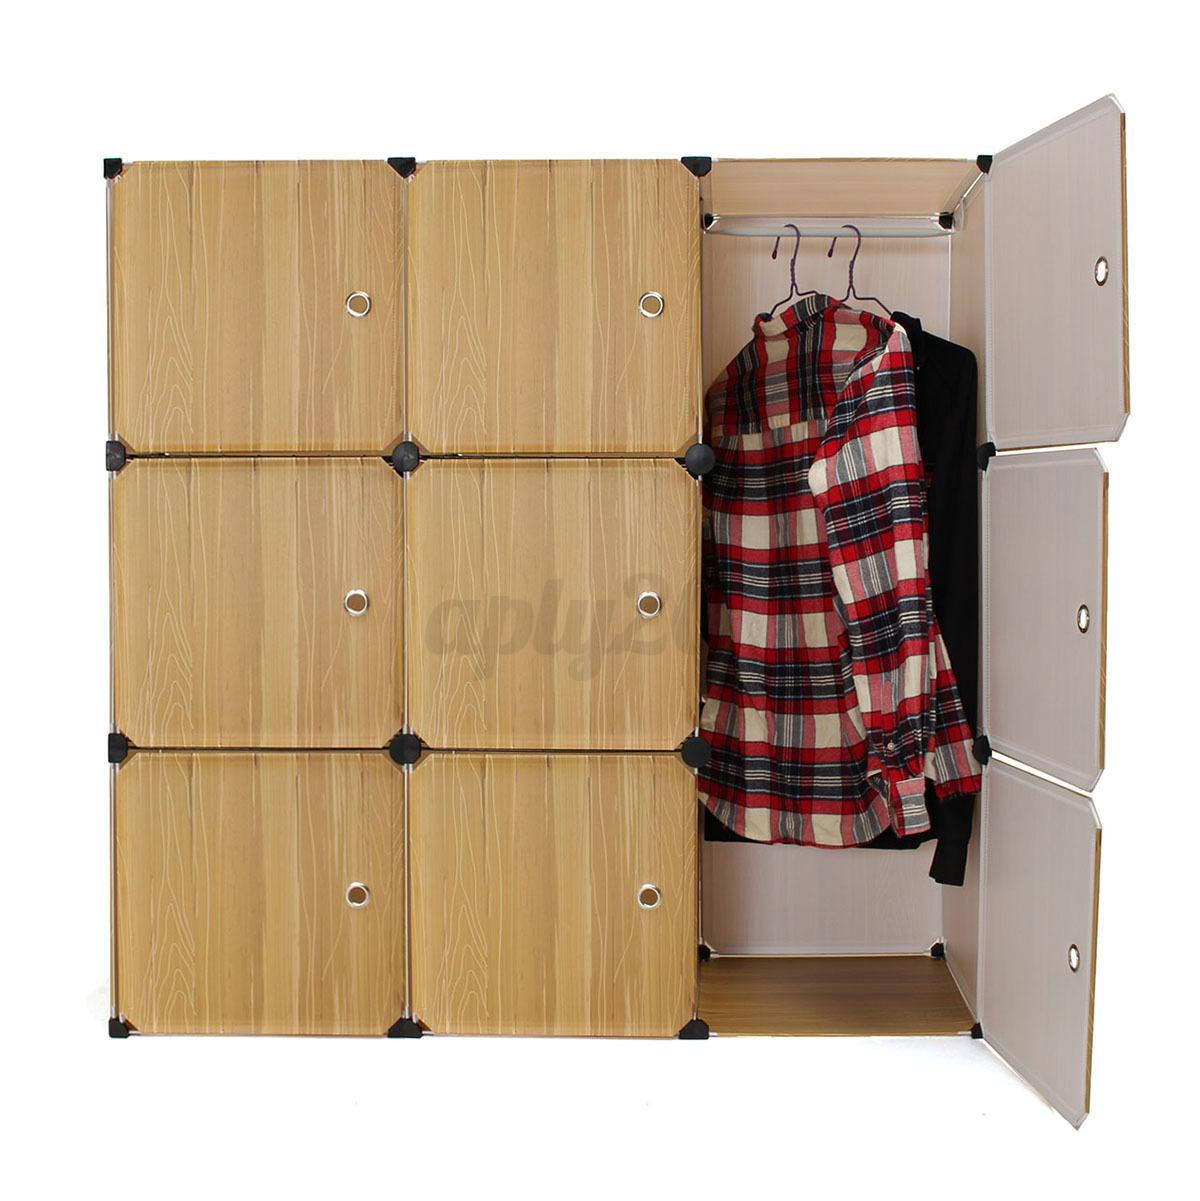 Diy portable closet storage organizer clothes wardrobe for Diy clothes closet